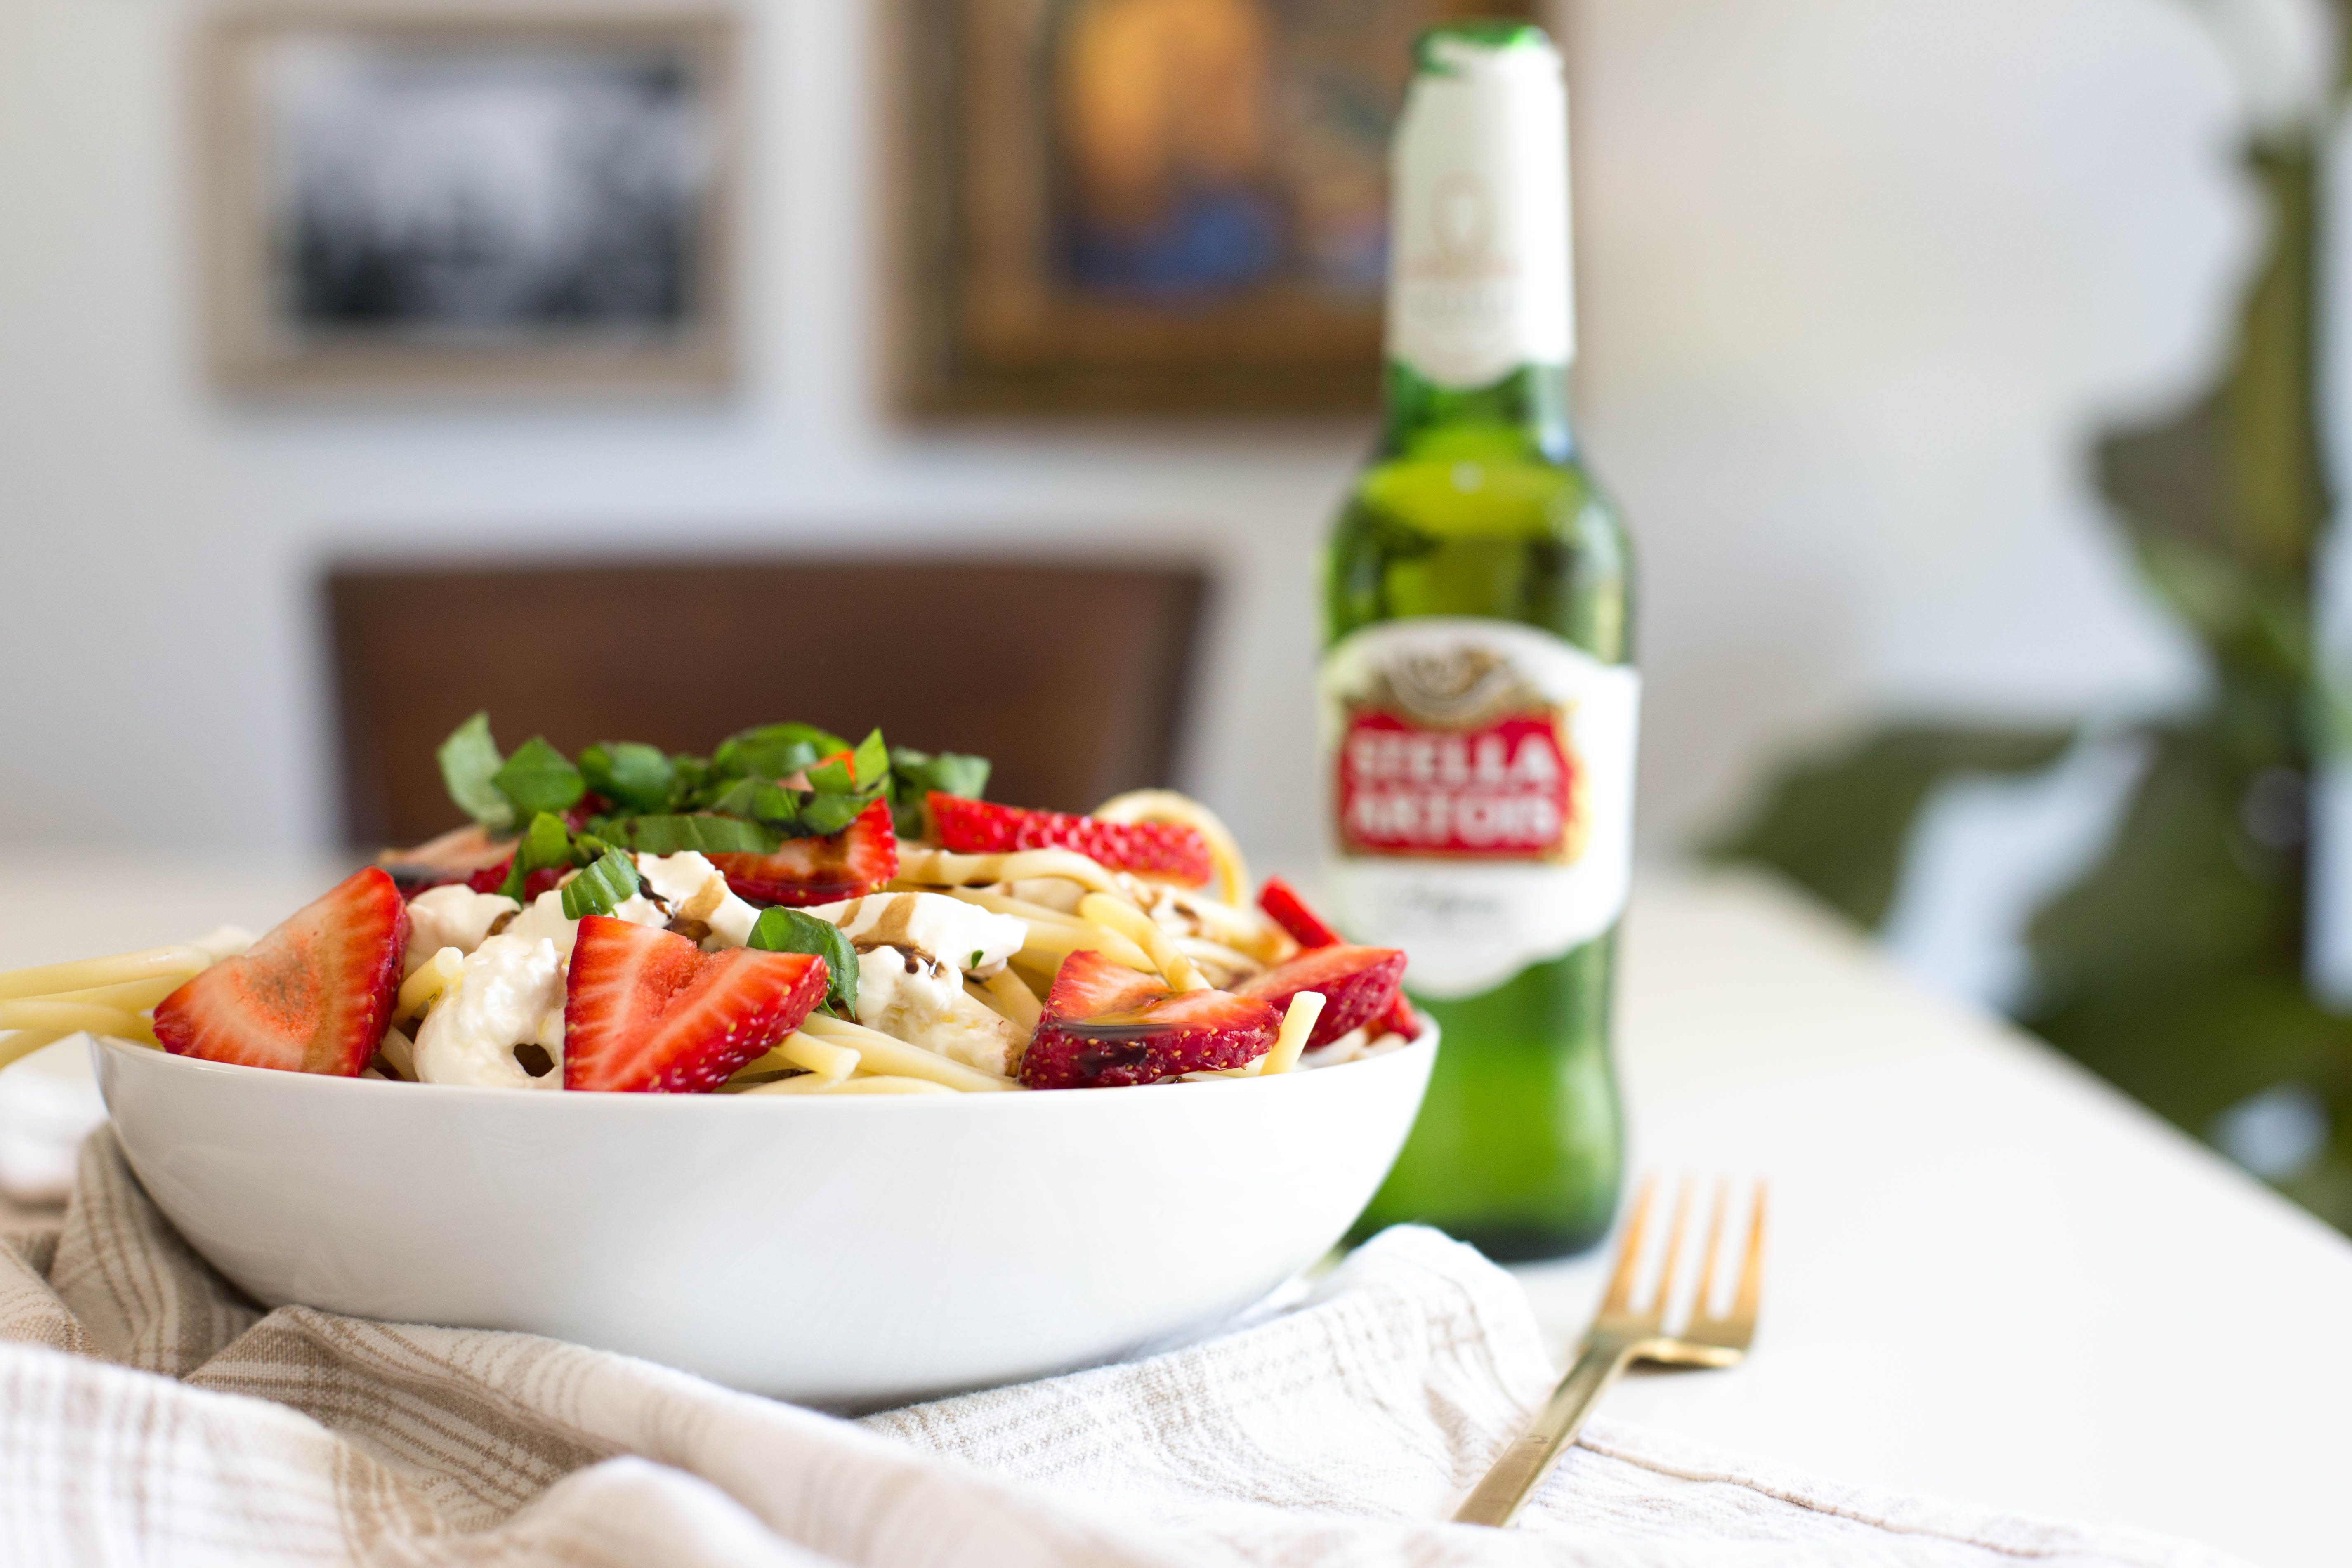 Summer Strawberry Pasta with Balsamic Glaze, Basil and Burrata